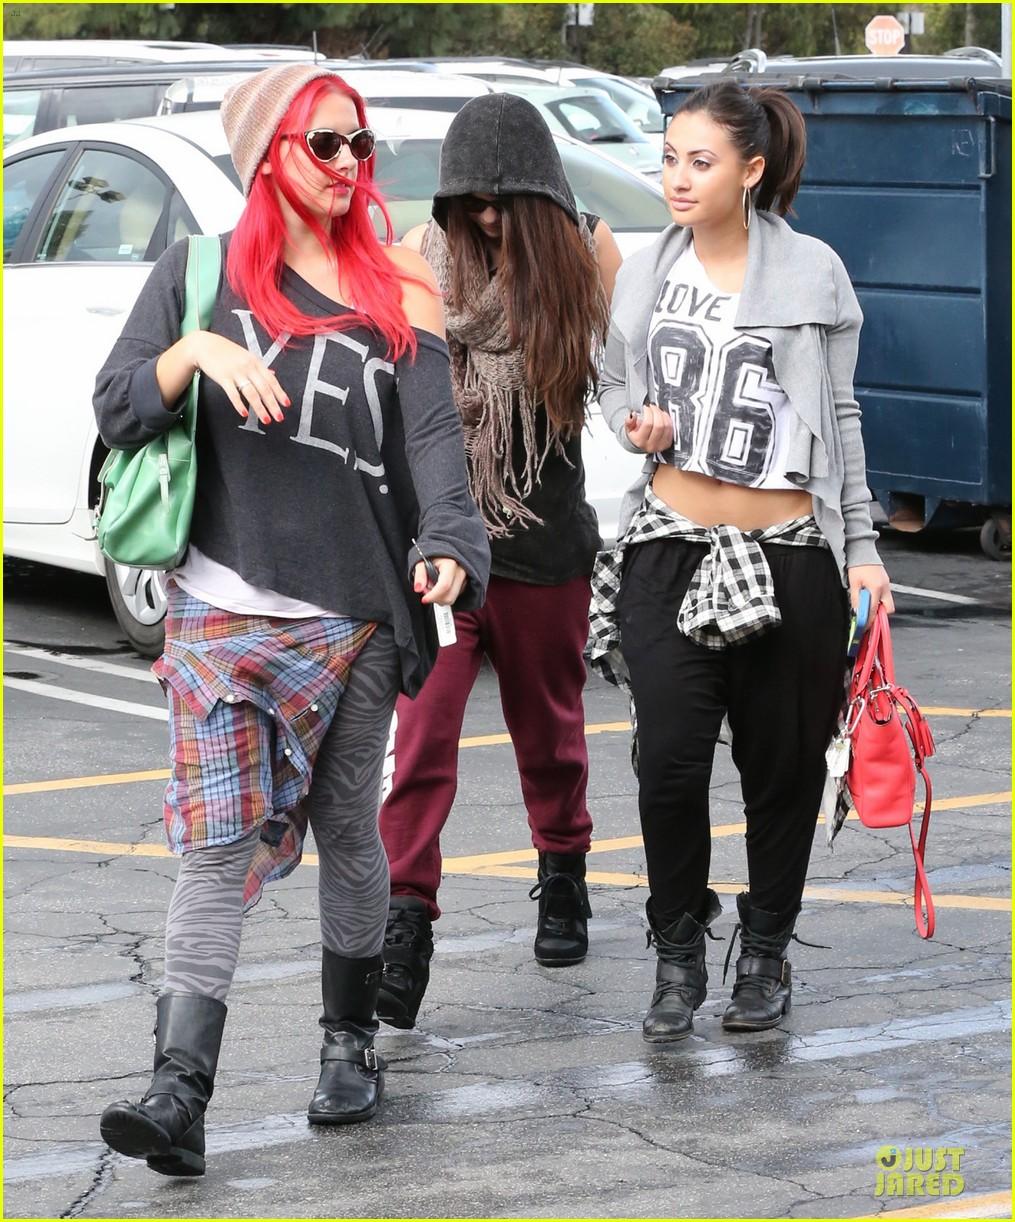 Francia Raisa And Selena Gomez Dancing Selena Gomez Dance Studio